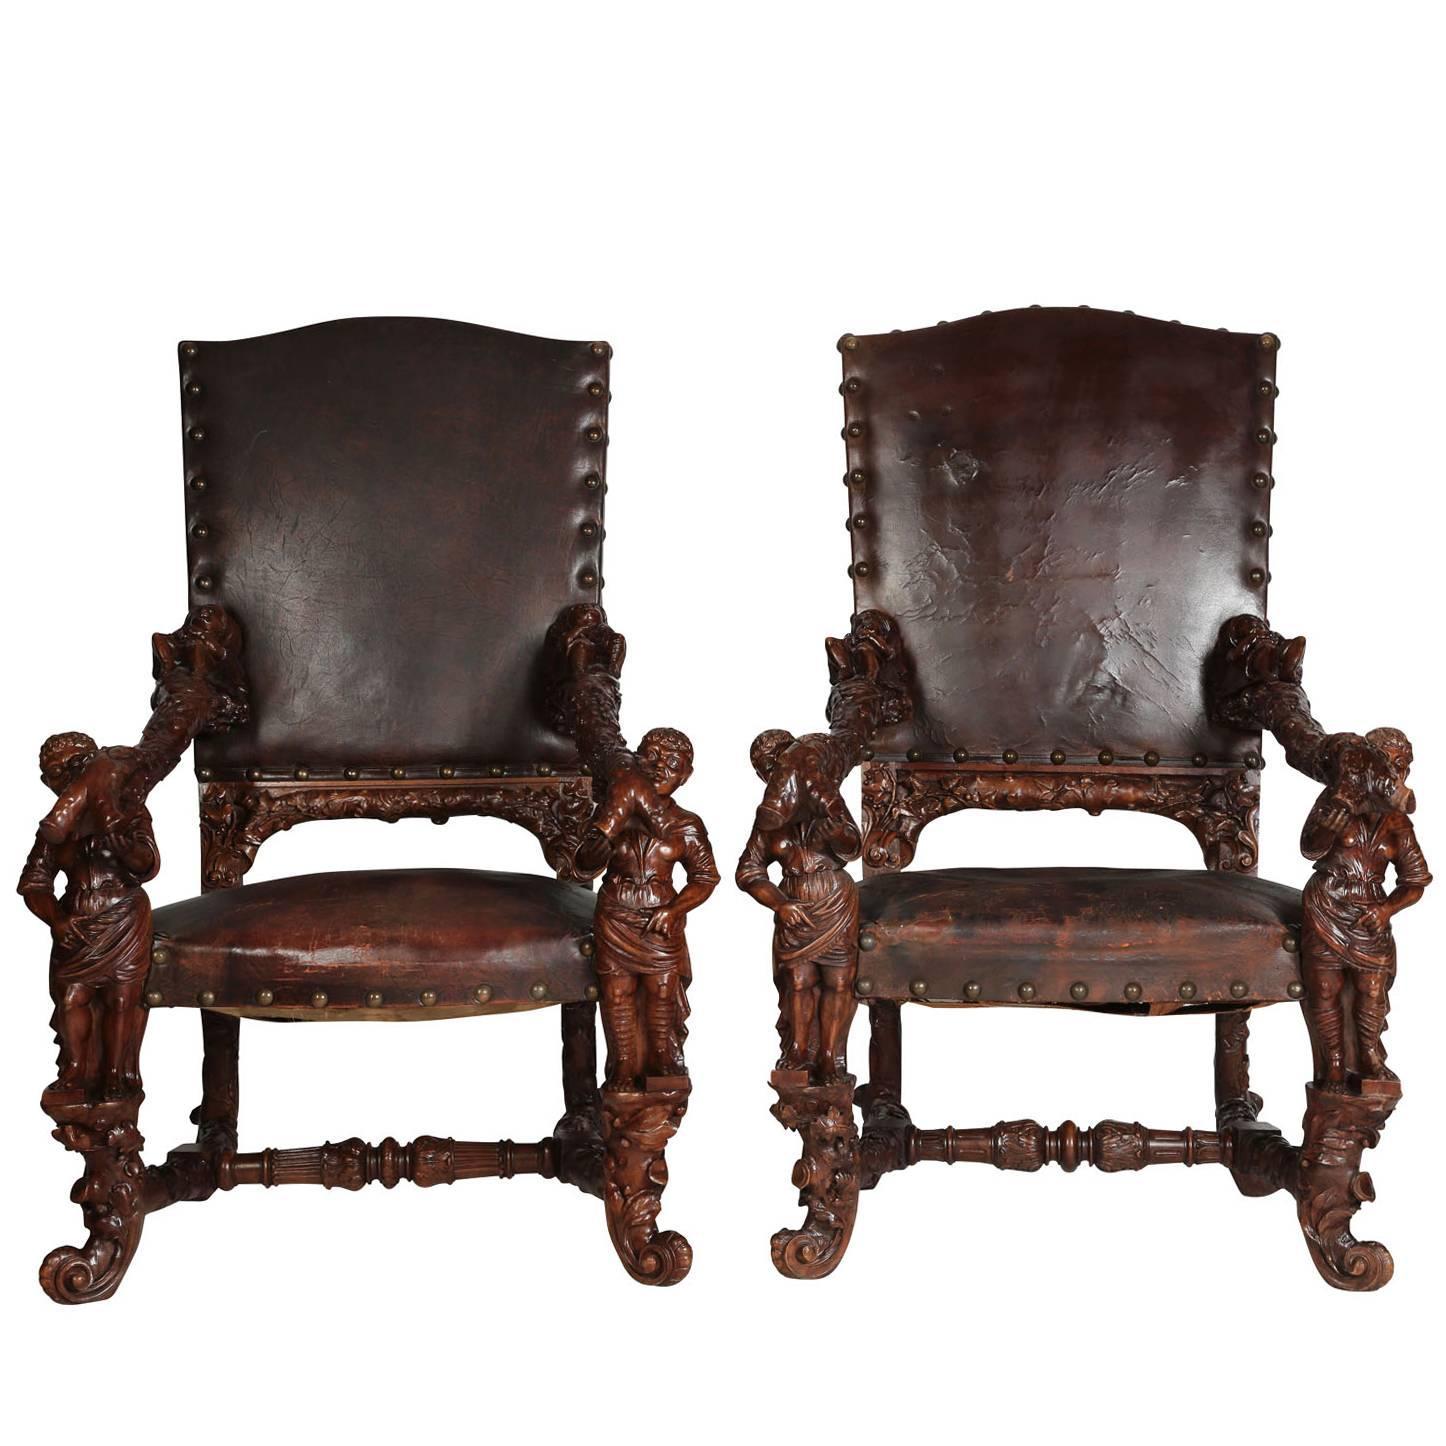 Pair of Palatial Venetian Walnut Carved Mid-19th Century Baroque Figural Thrones